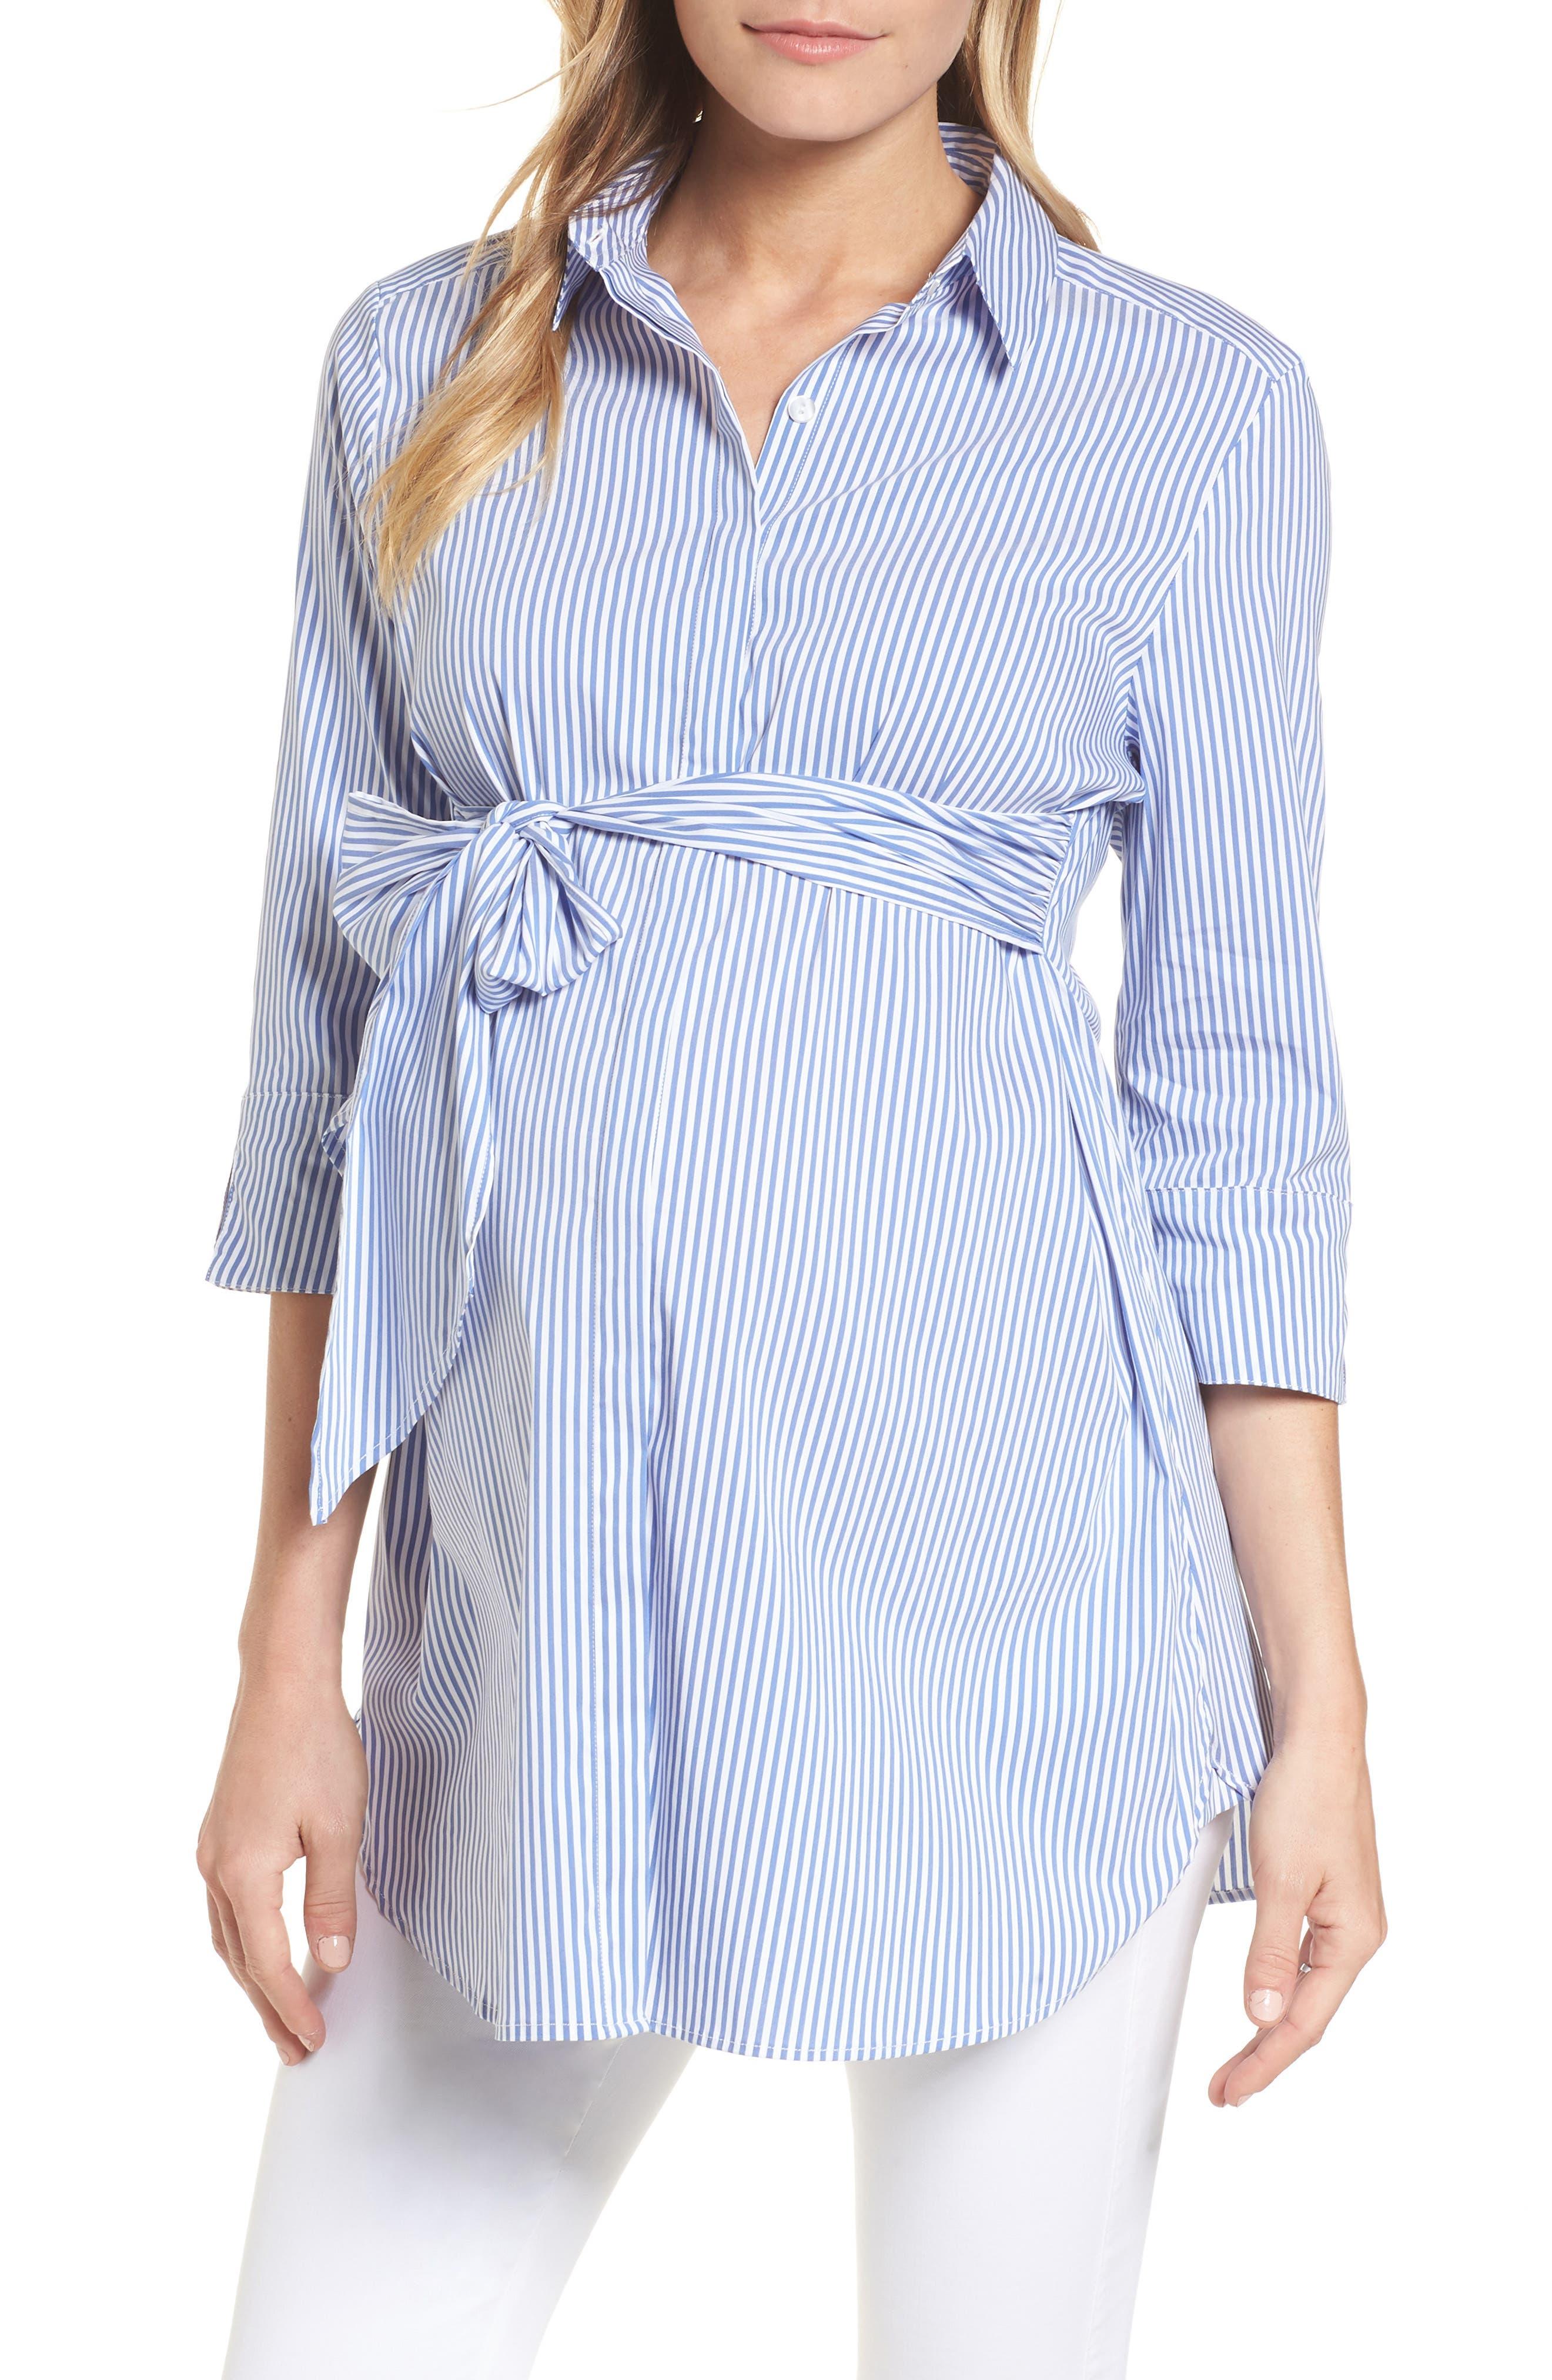 Dora Tie Front Maternity Shirt,                             Main thumbnail 1, color,                             BLUE/WHITE STRIPE